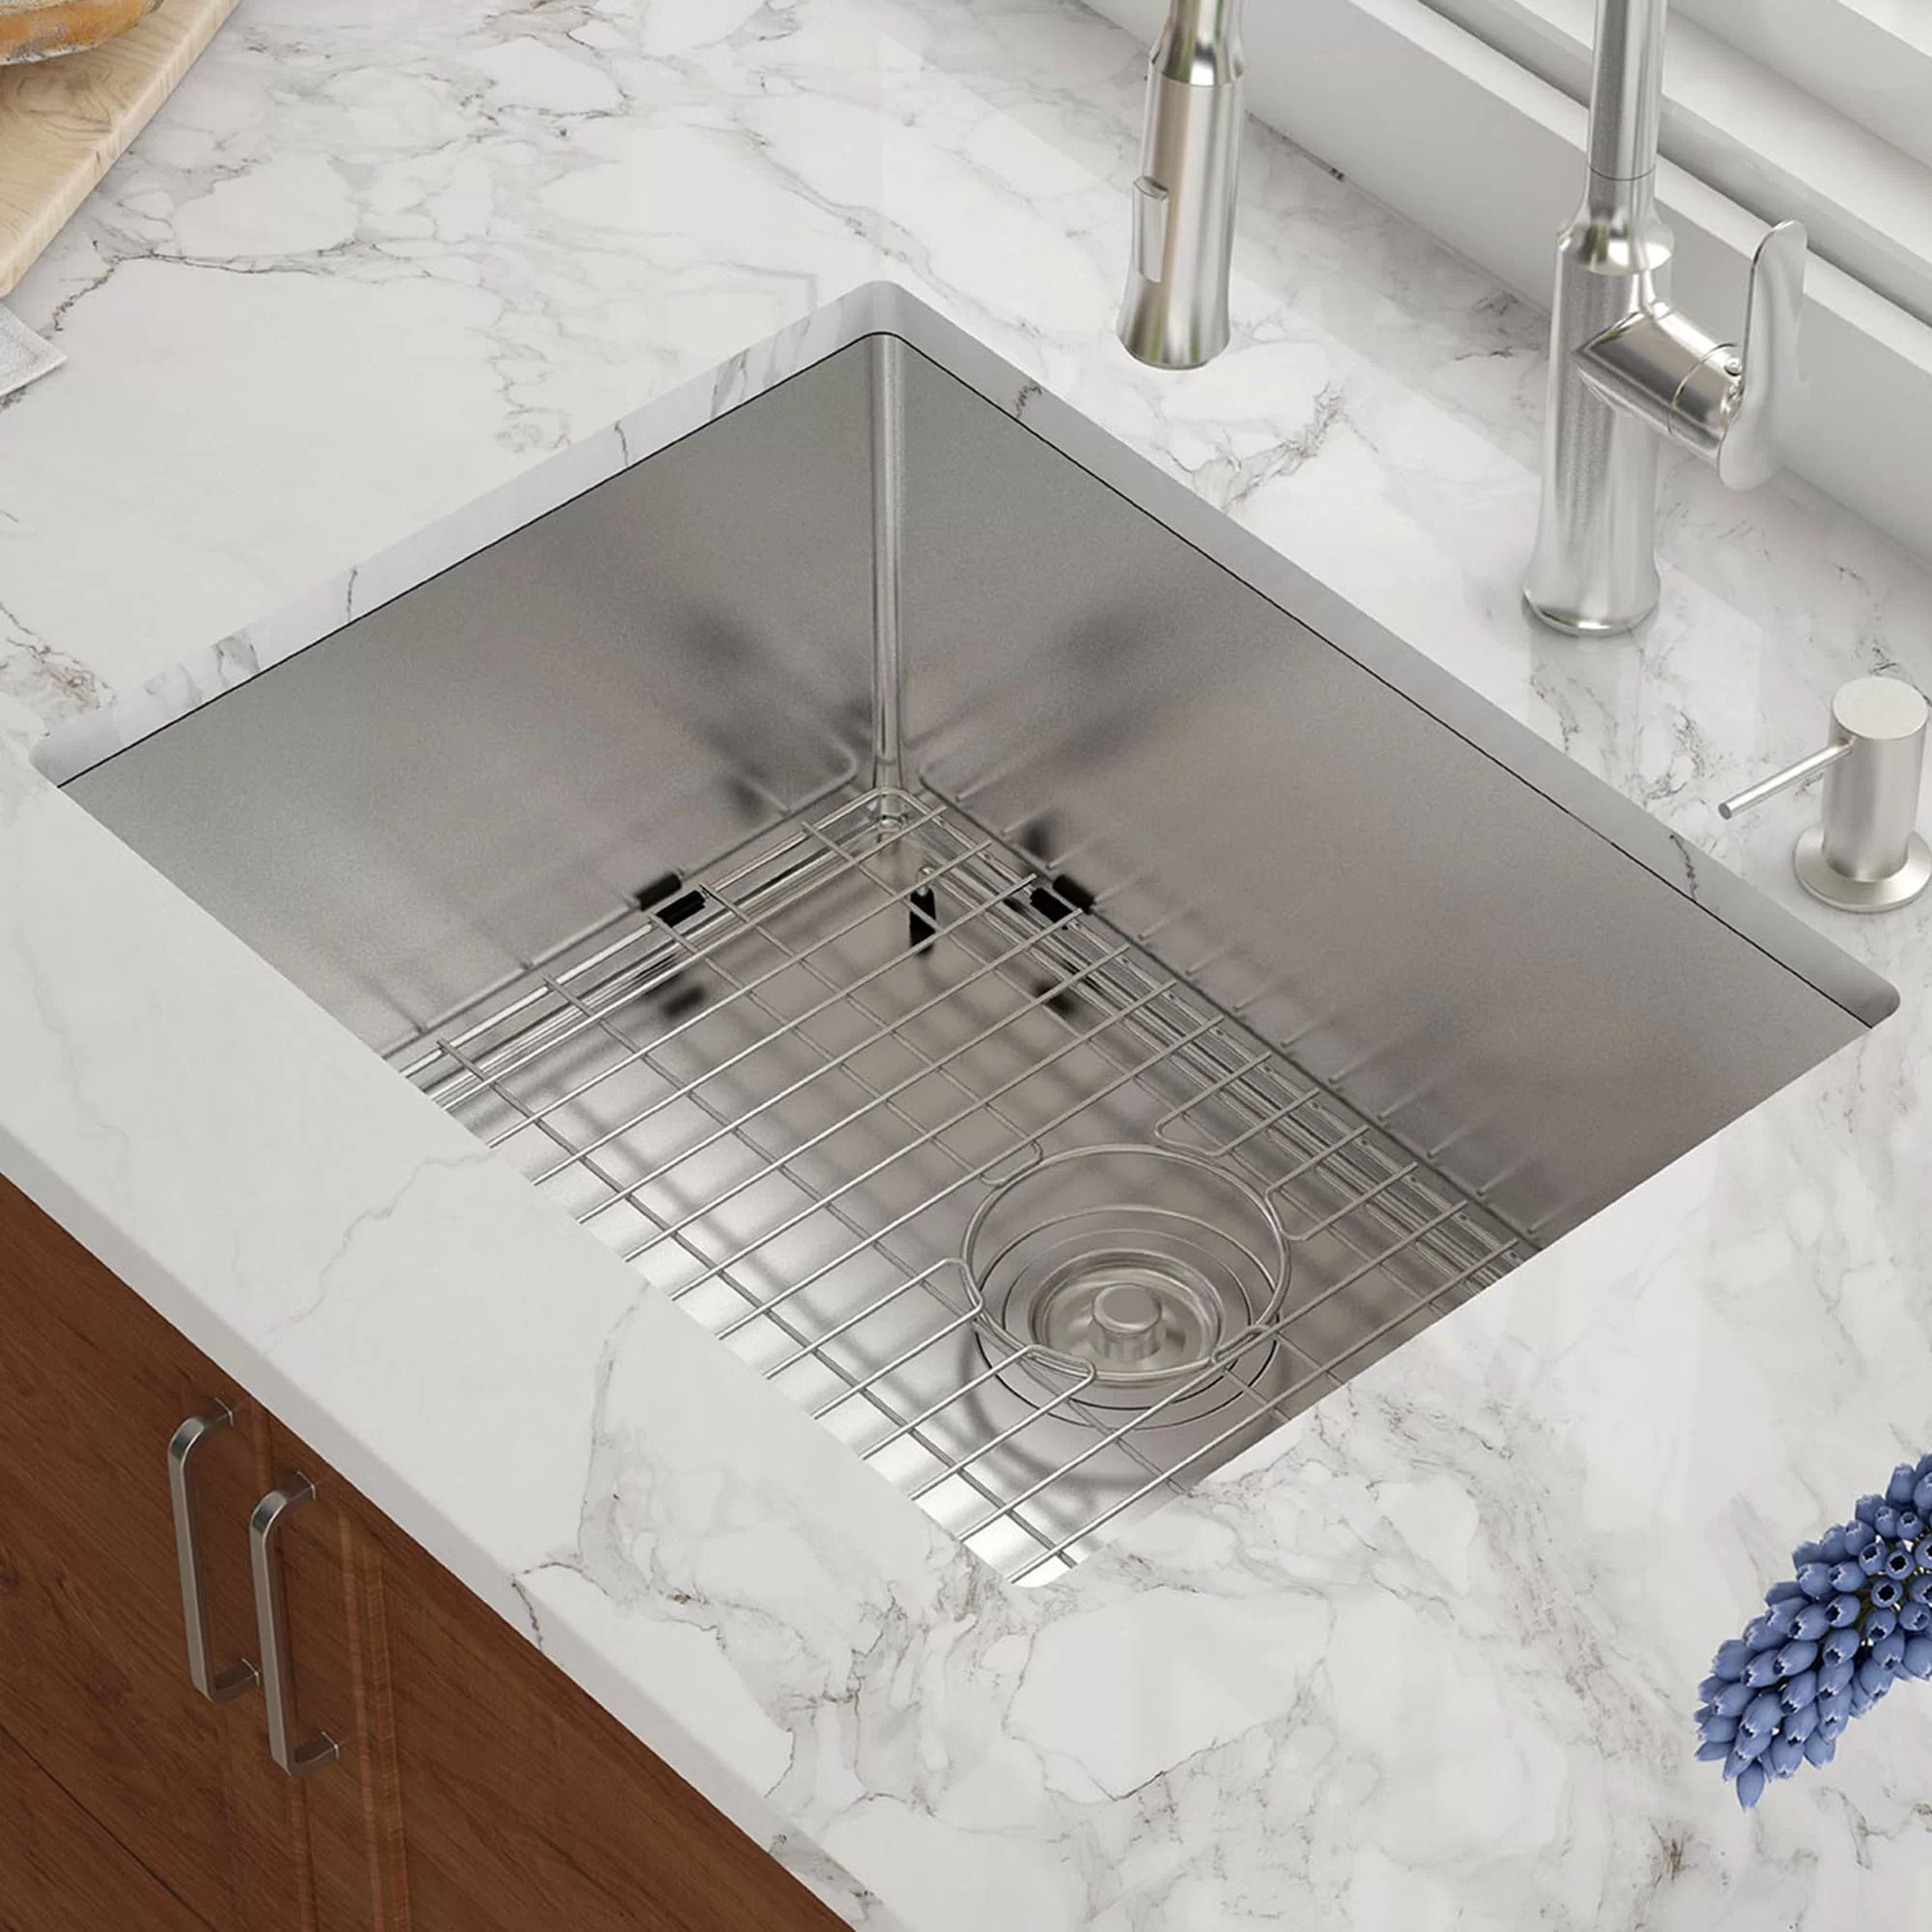 high end kitchen sinks drop ceiling lighting khu101 23 kraus l x 18 w undermount sink reviews